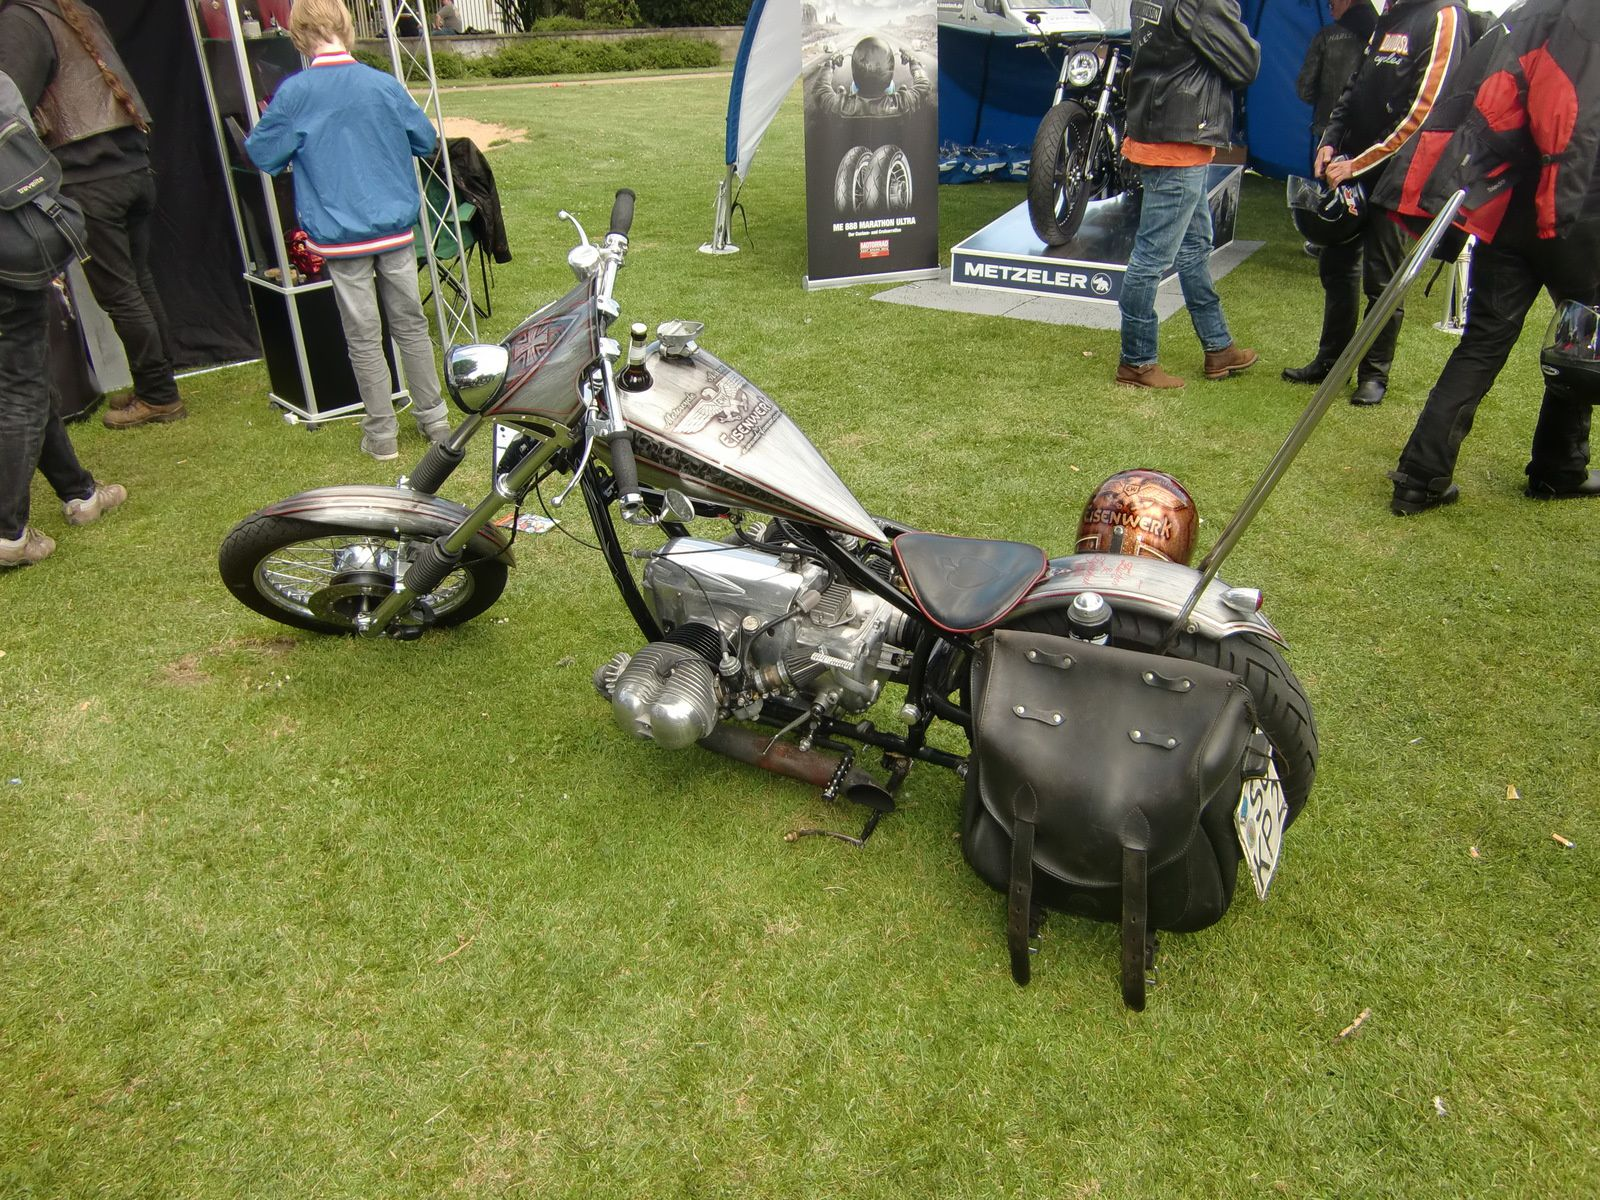 Harley Dome  Cologne &quot&#x3B;Köln &quot&#x3B;